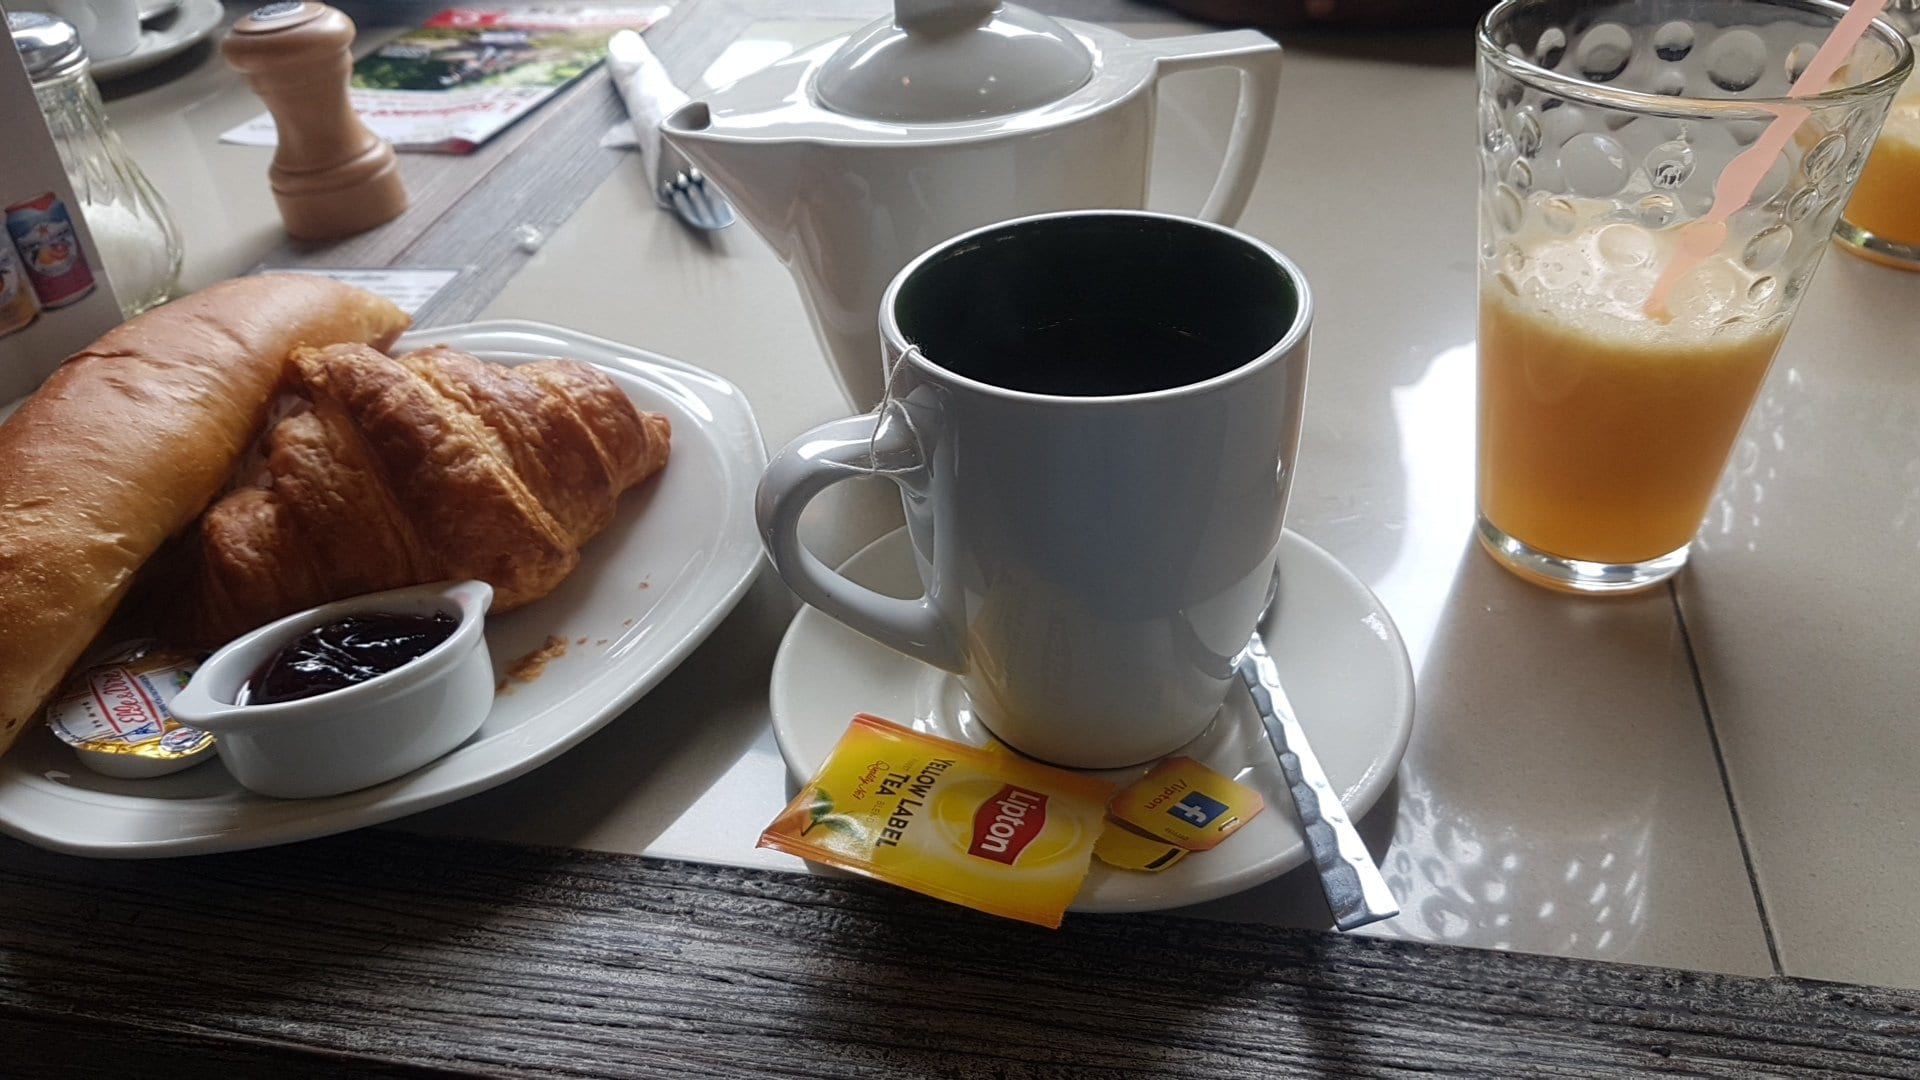 Patisserie nouvelle best bakeries & cafes in Kinshasa